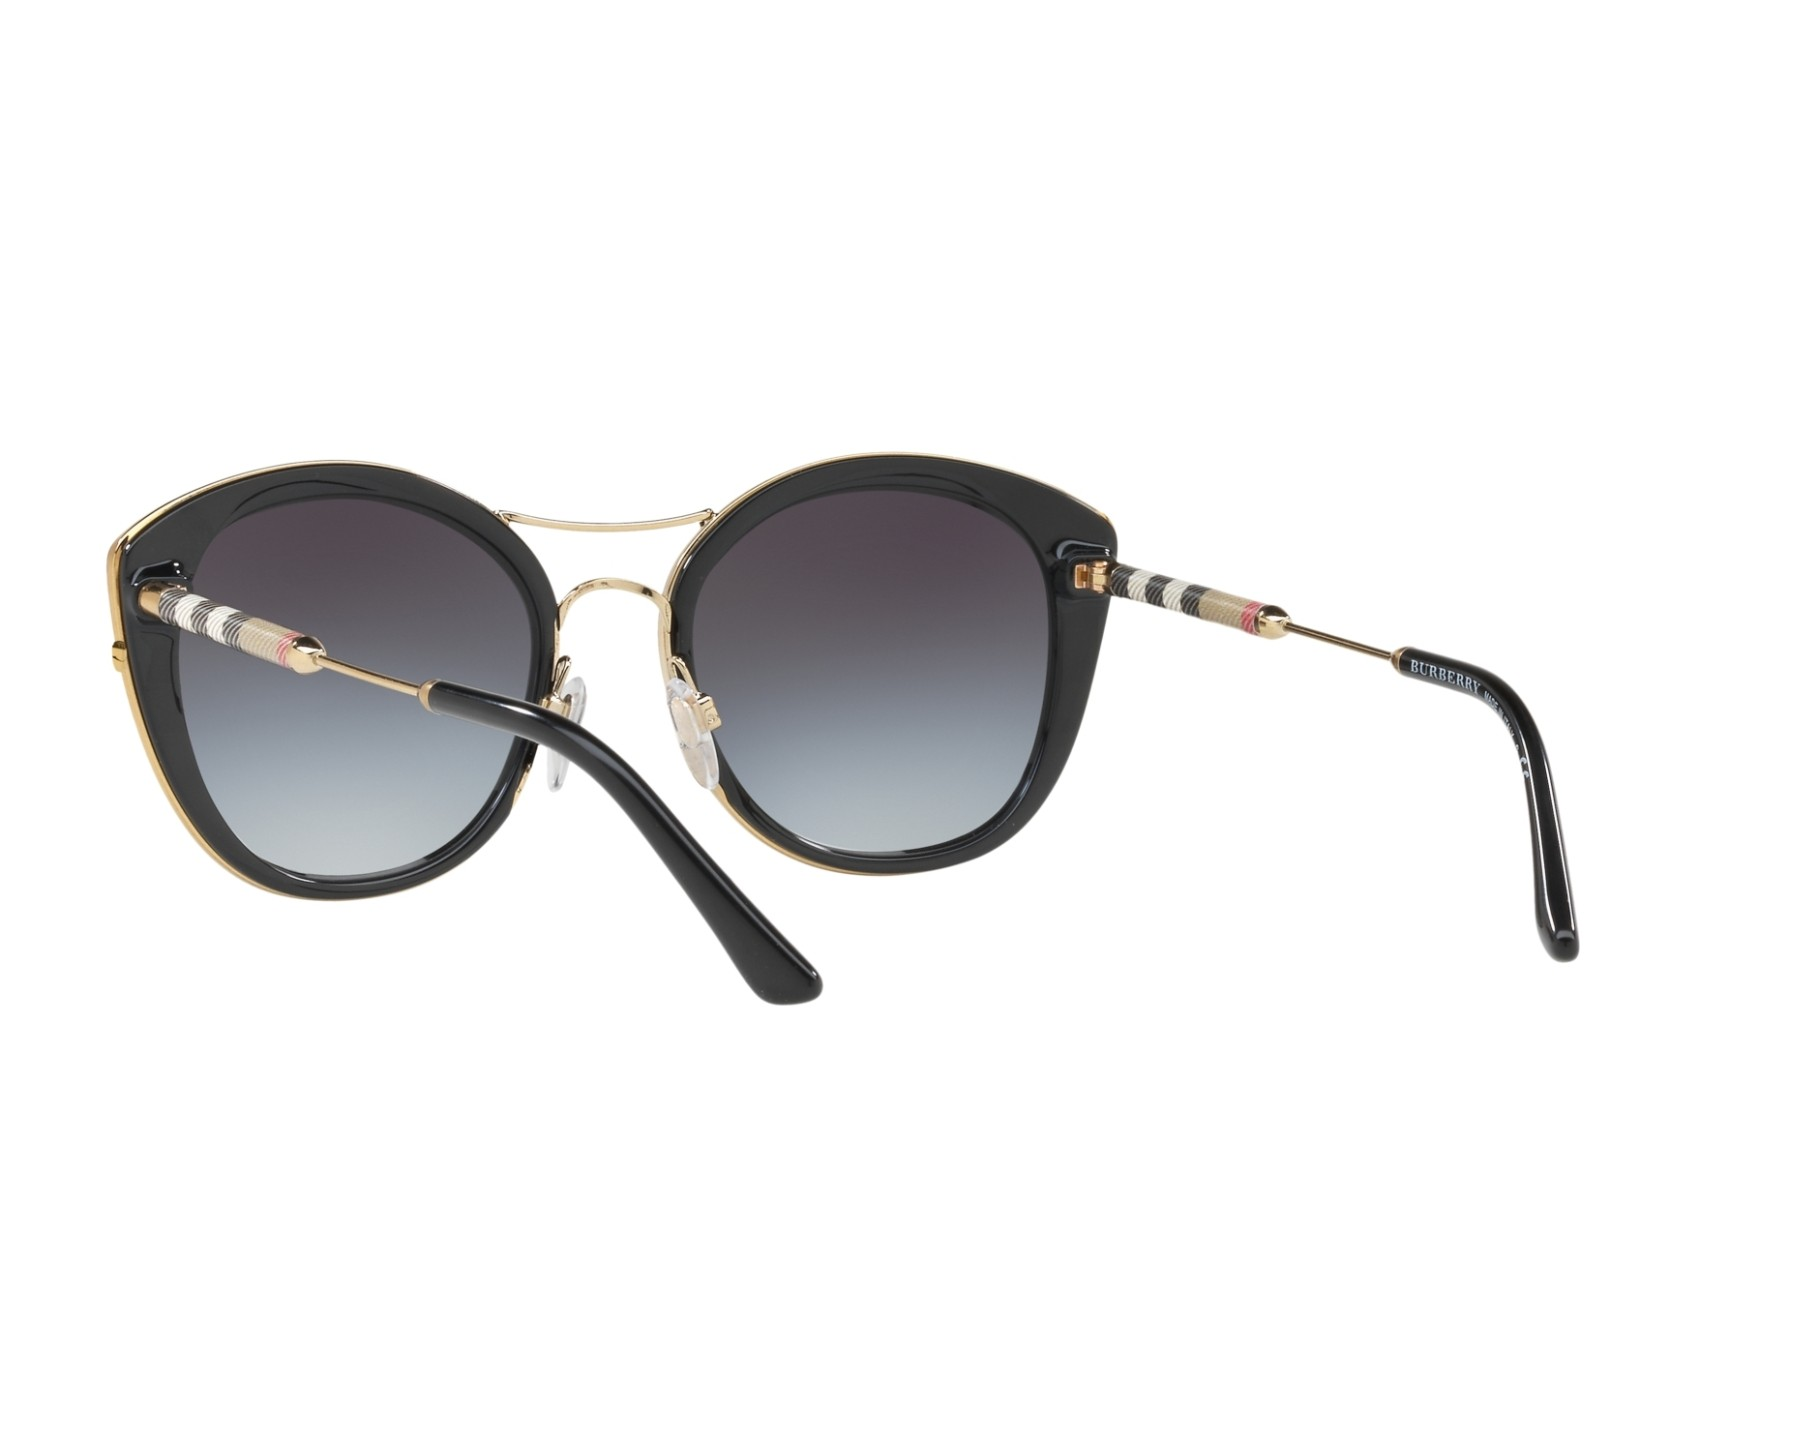 BURBERRY Burberry Damen Sonnenbrille » BE4251Q«, schwarz, 30018G - schwarz/grau